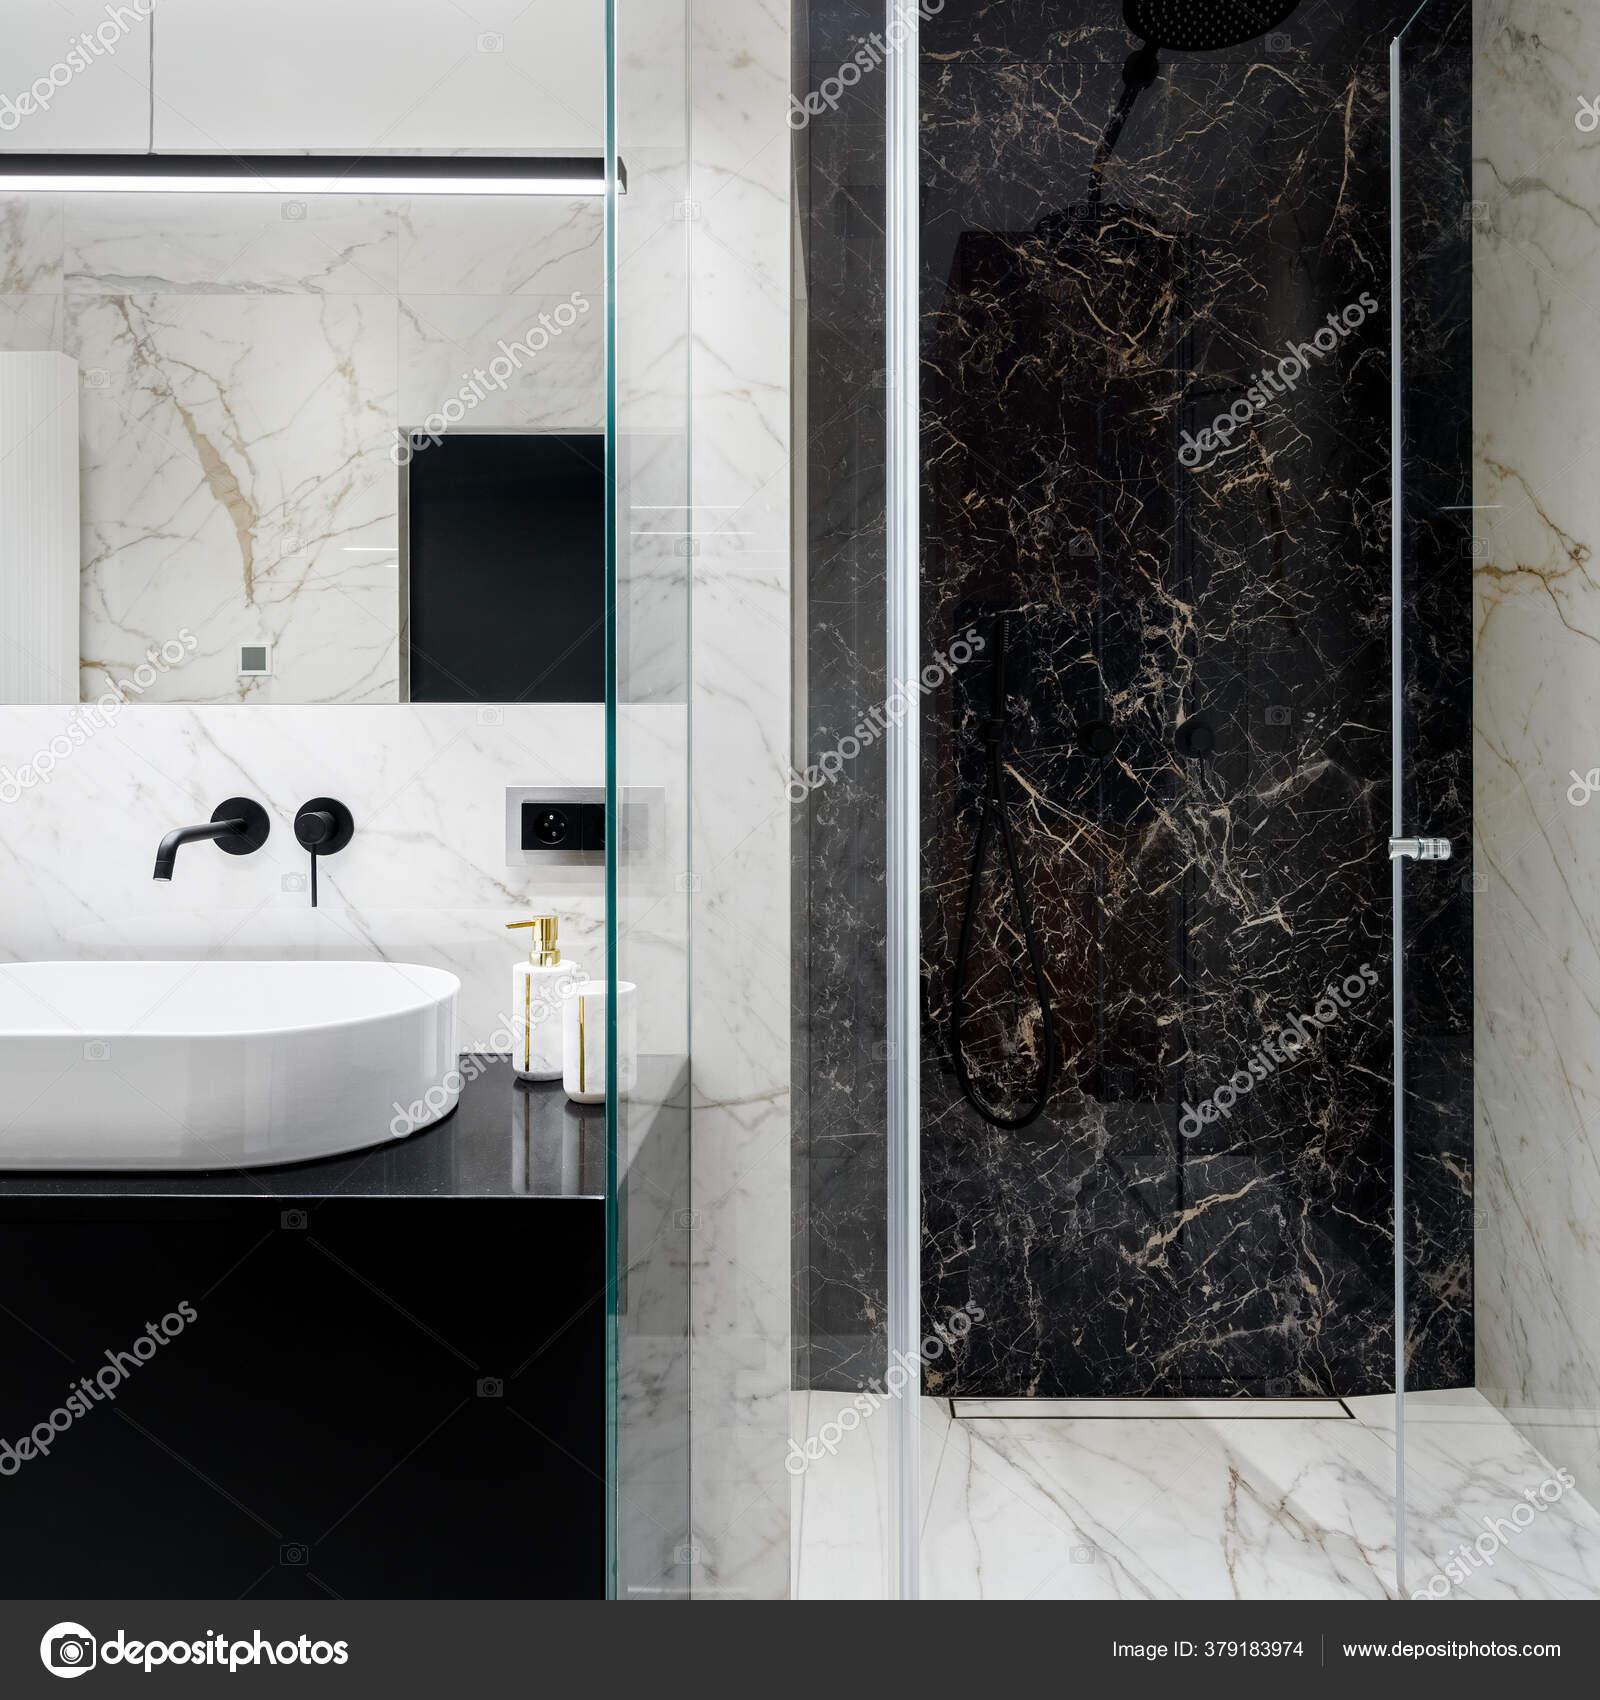 Elegant Bathroom Spacious Shower Black White Marble Tiles Walls Floor Stock Photo C In4mal 379183974